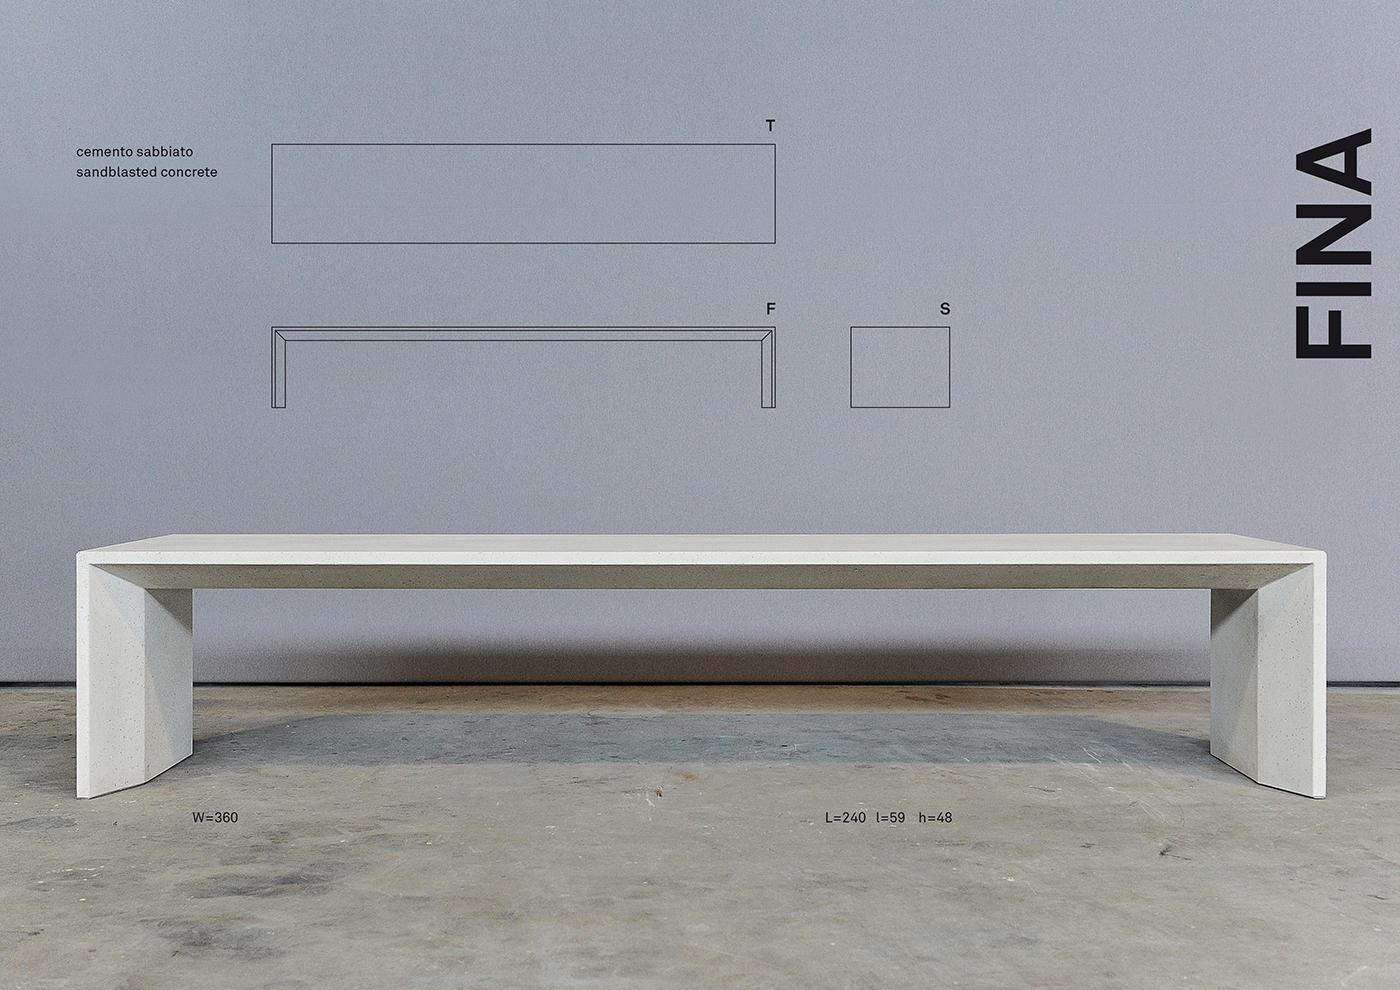 FINA design di una panchina in cemento disegnata da Francesco Aureli